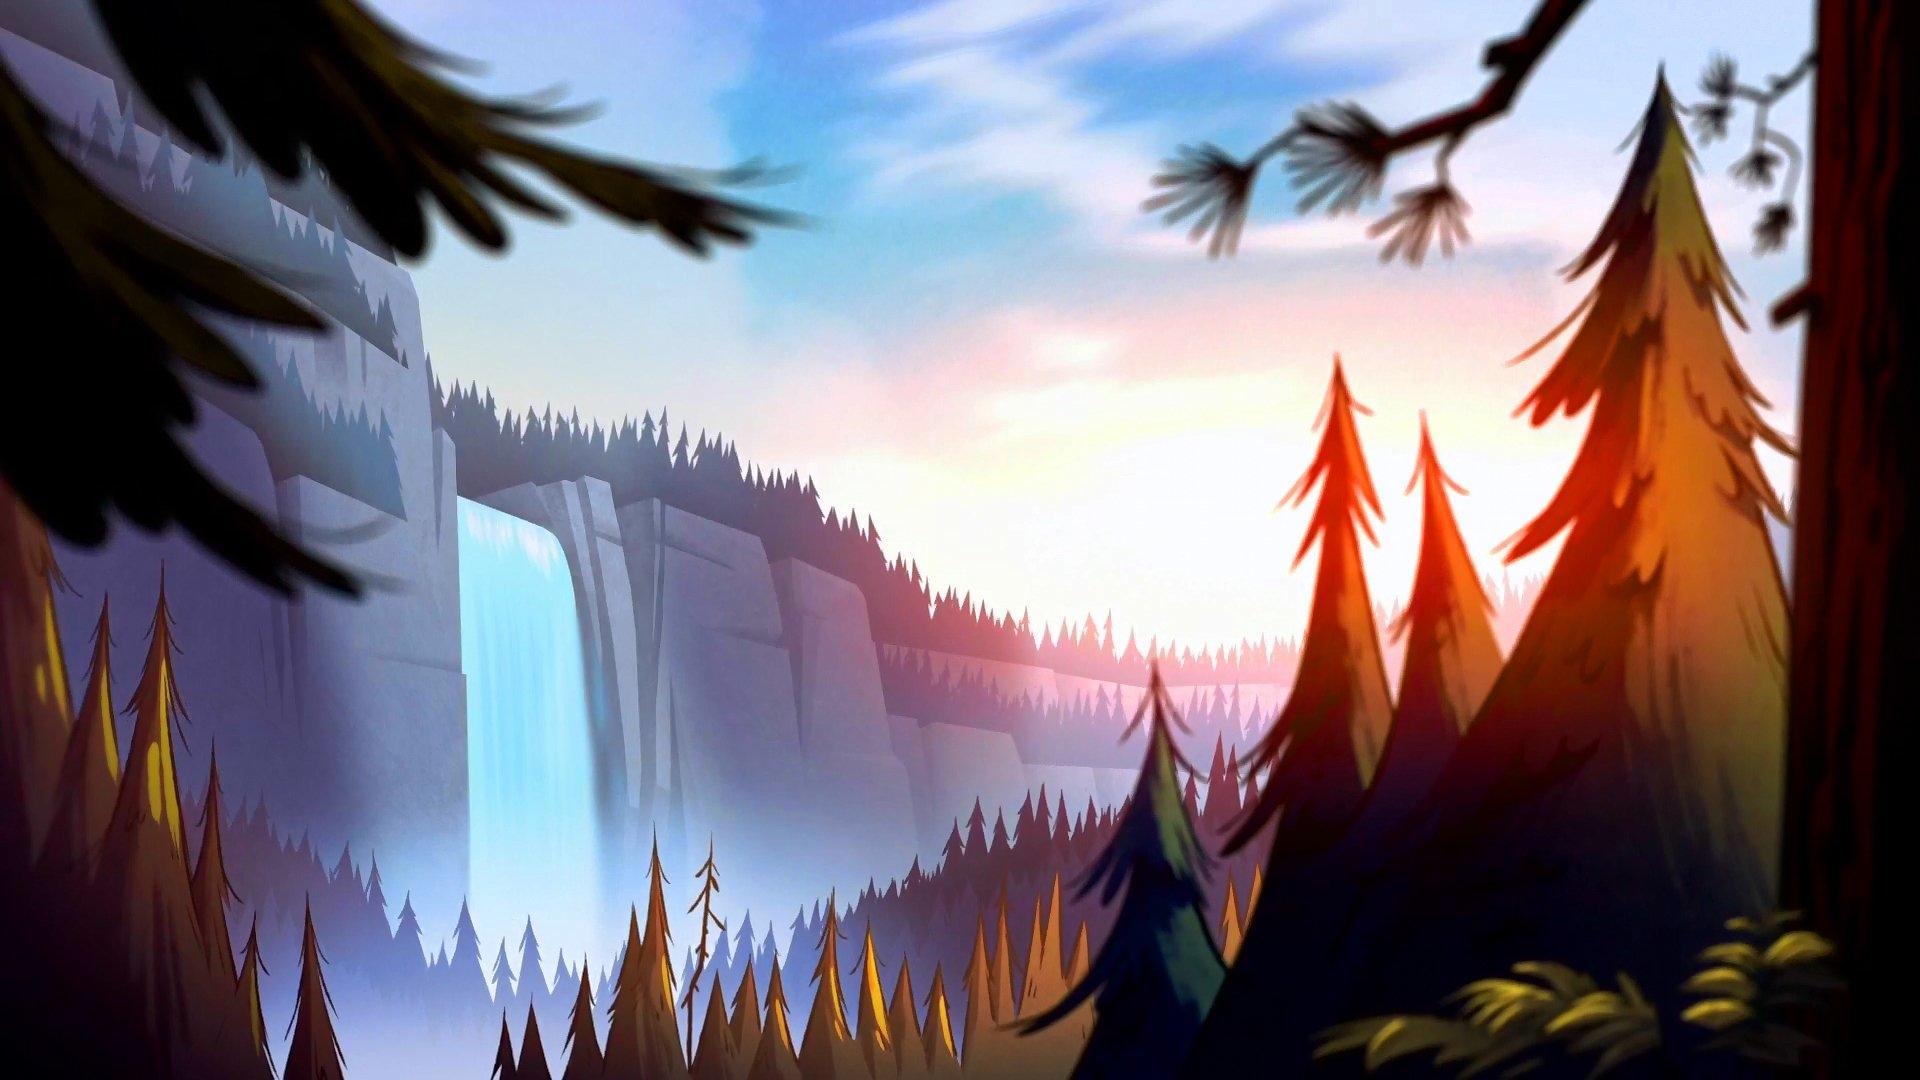 Gravity Falls All Characters Wallpaper Gravity Falls Wallpaper Hd Download